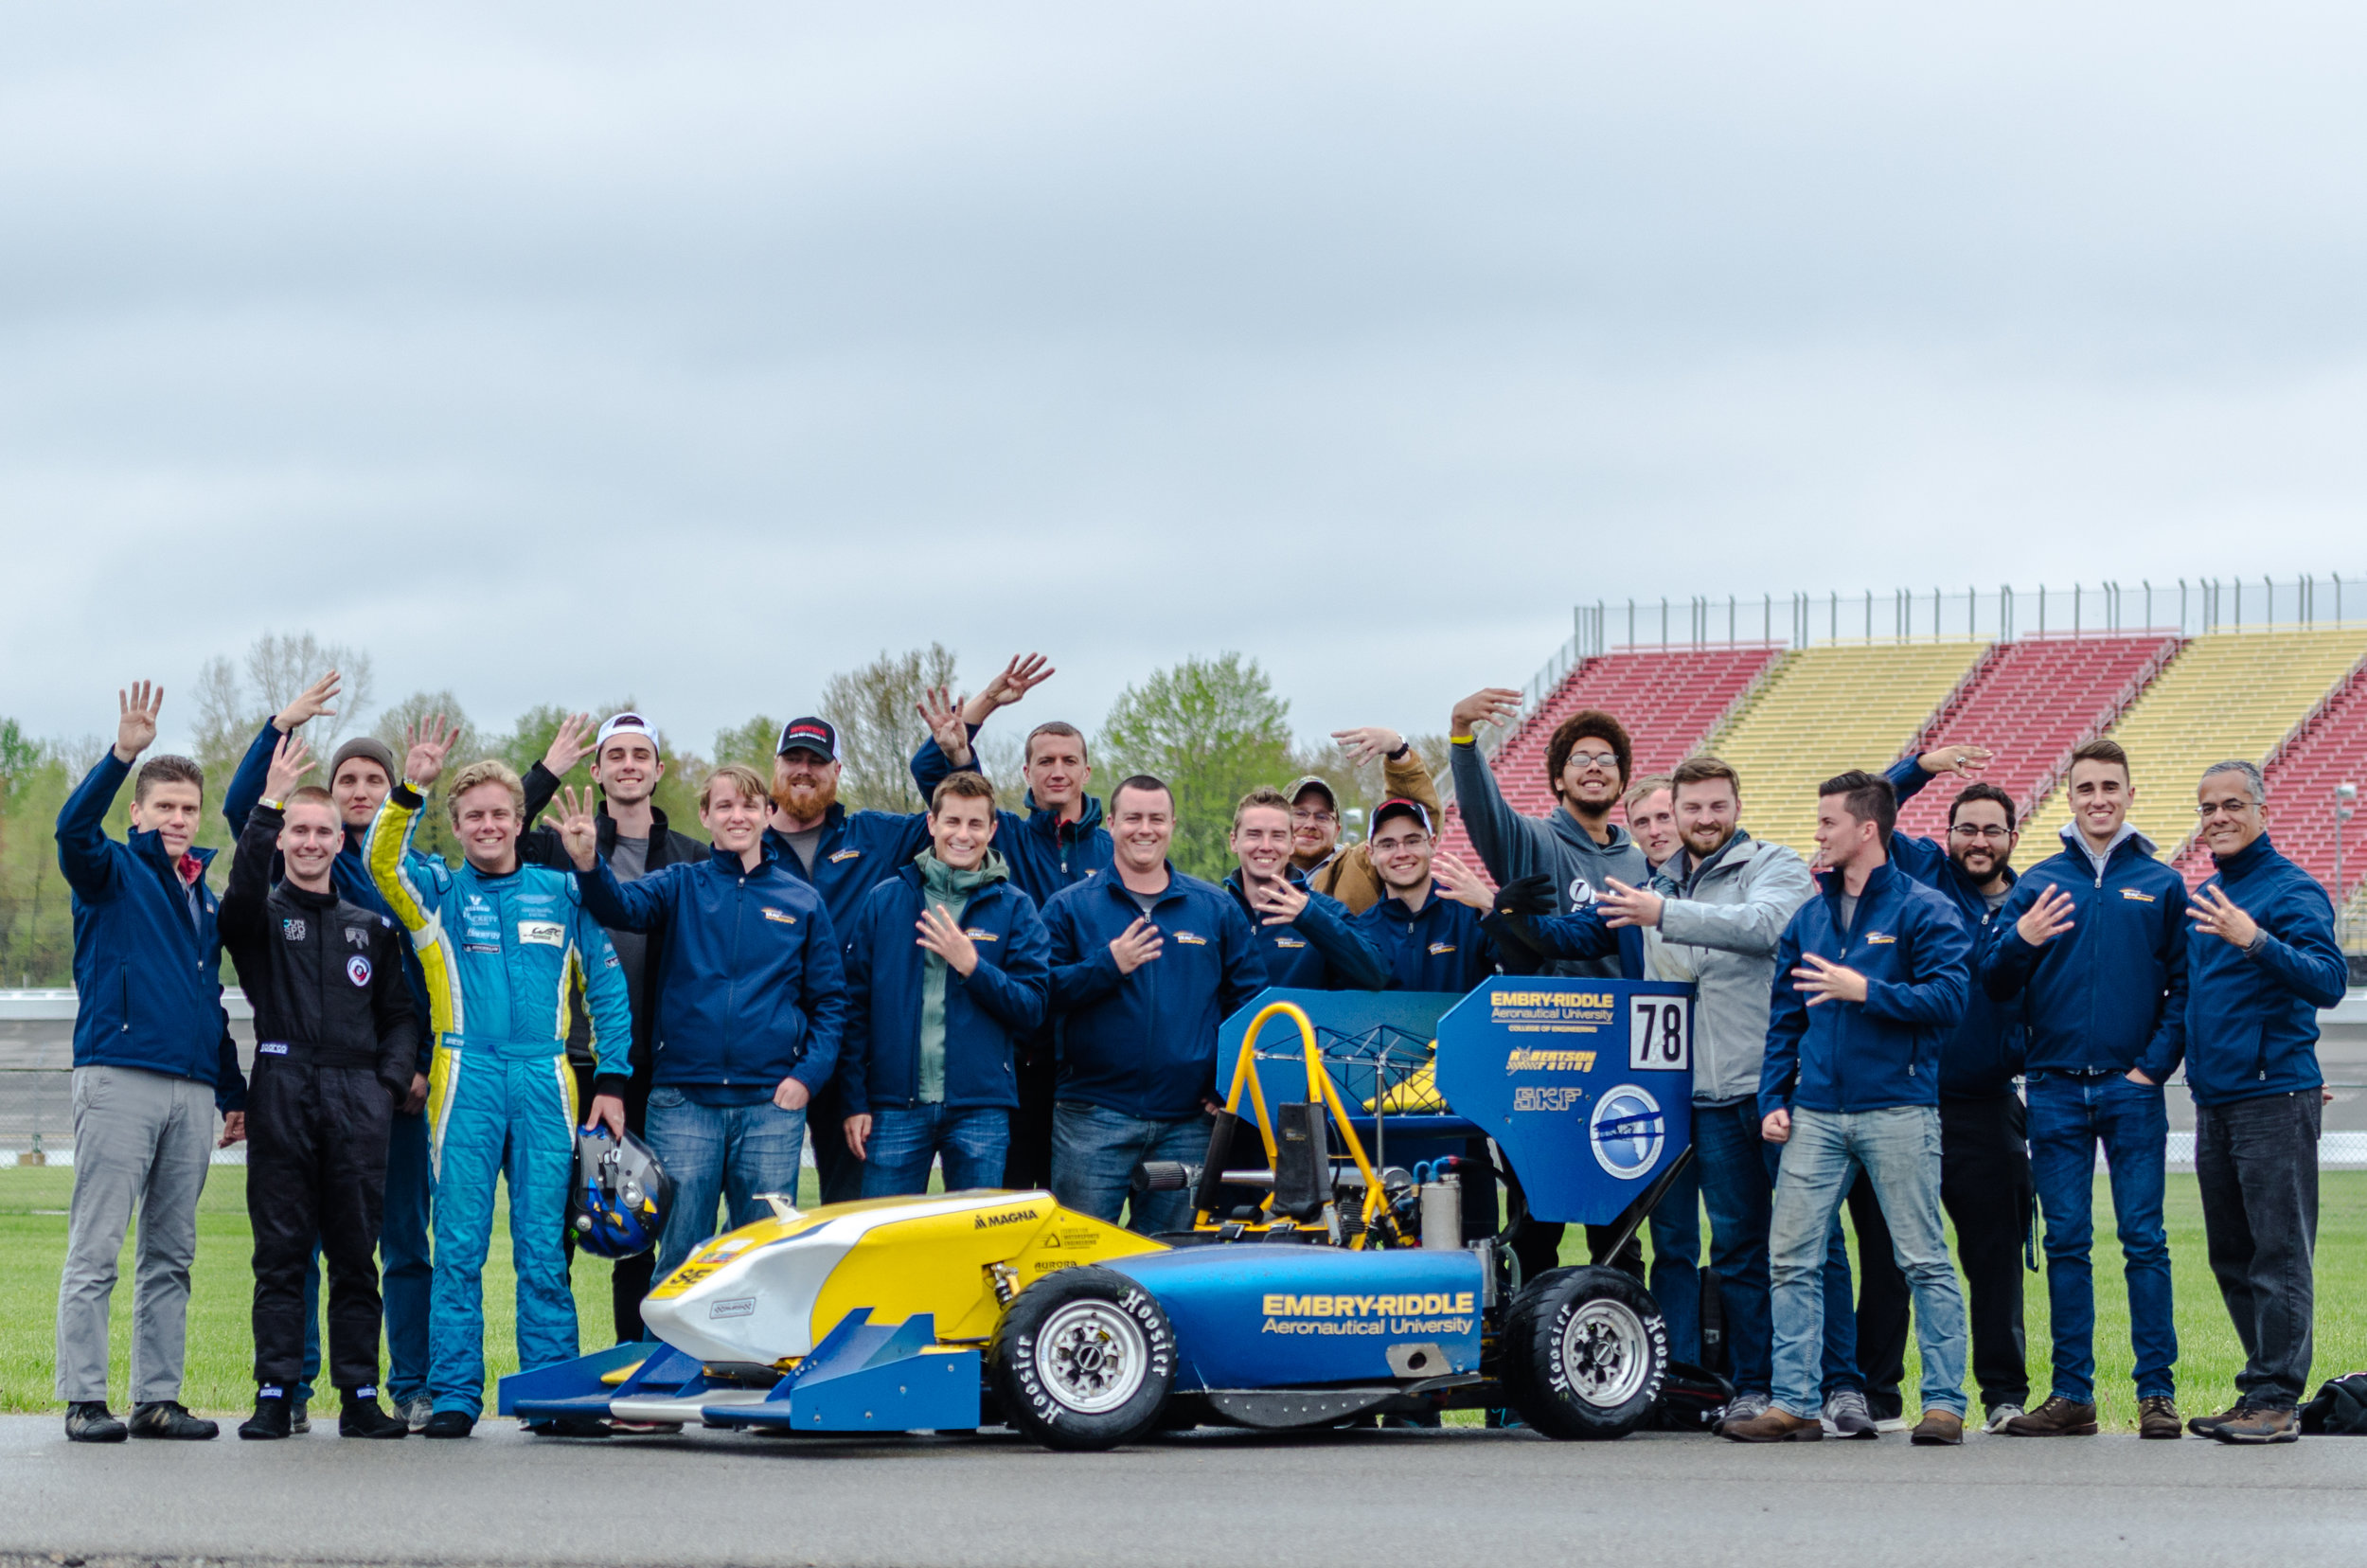 ERAU Motorsports Team at FSAE Michigan 2018